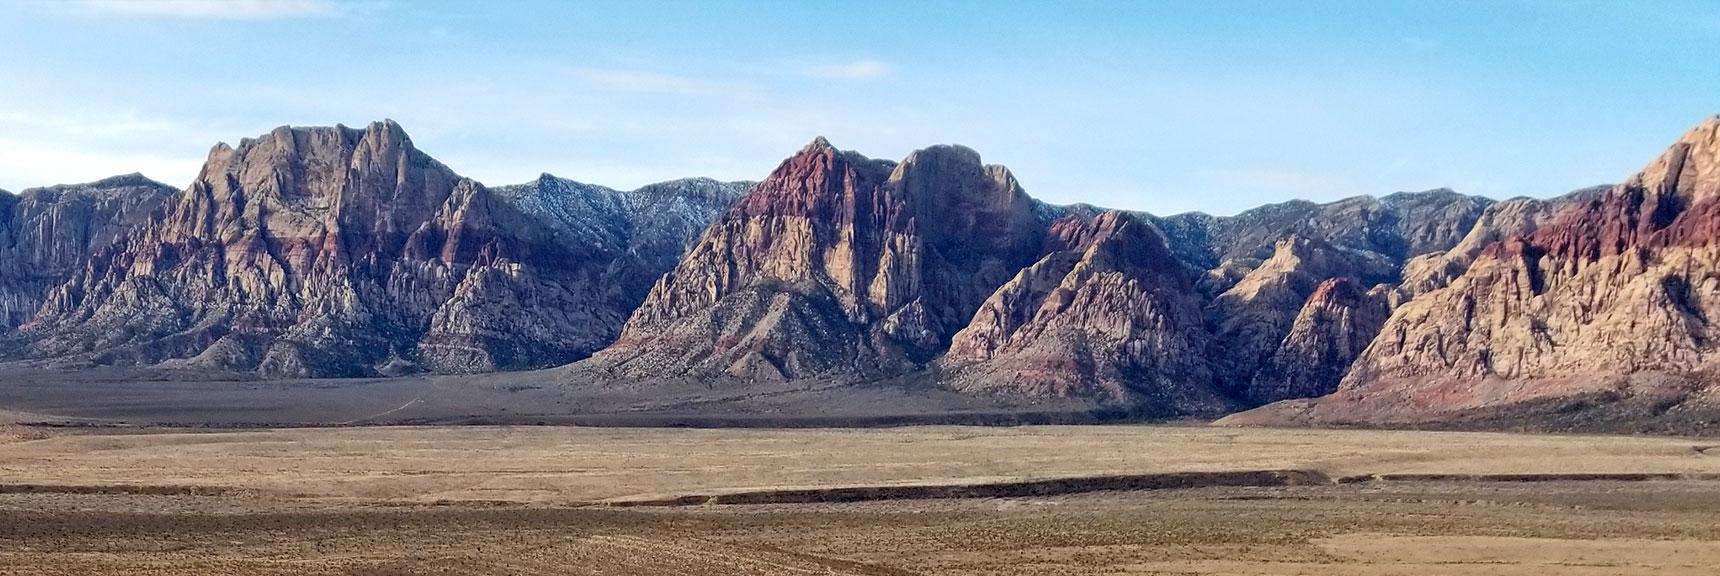 Rainbow Mountain Viewed from Turtlehead Peak Summit in Red Rock National Park, Nevada